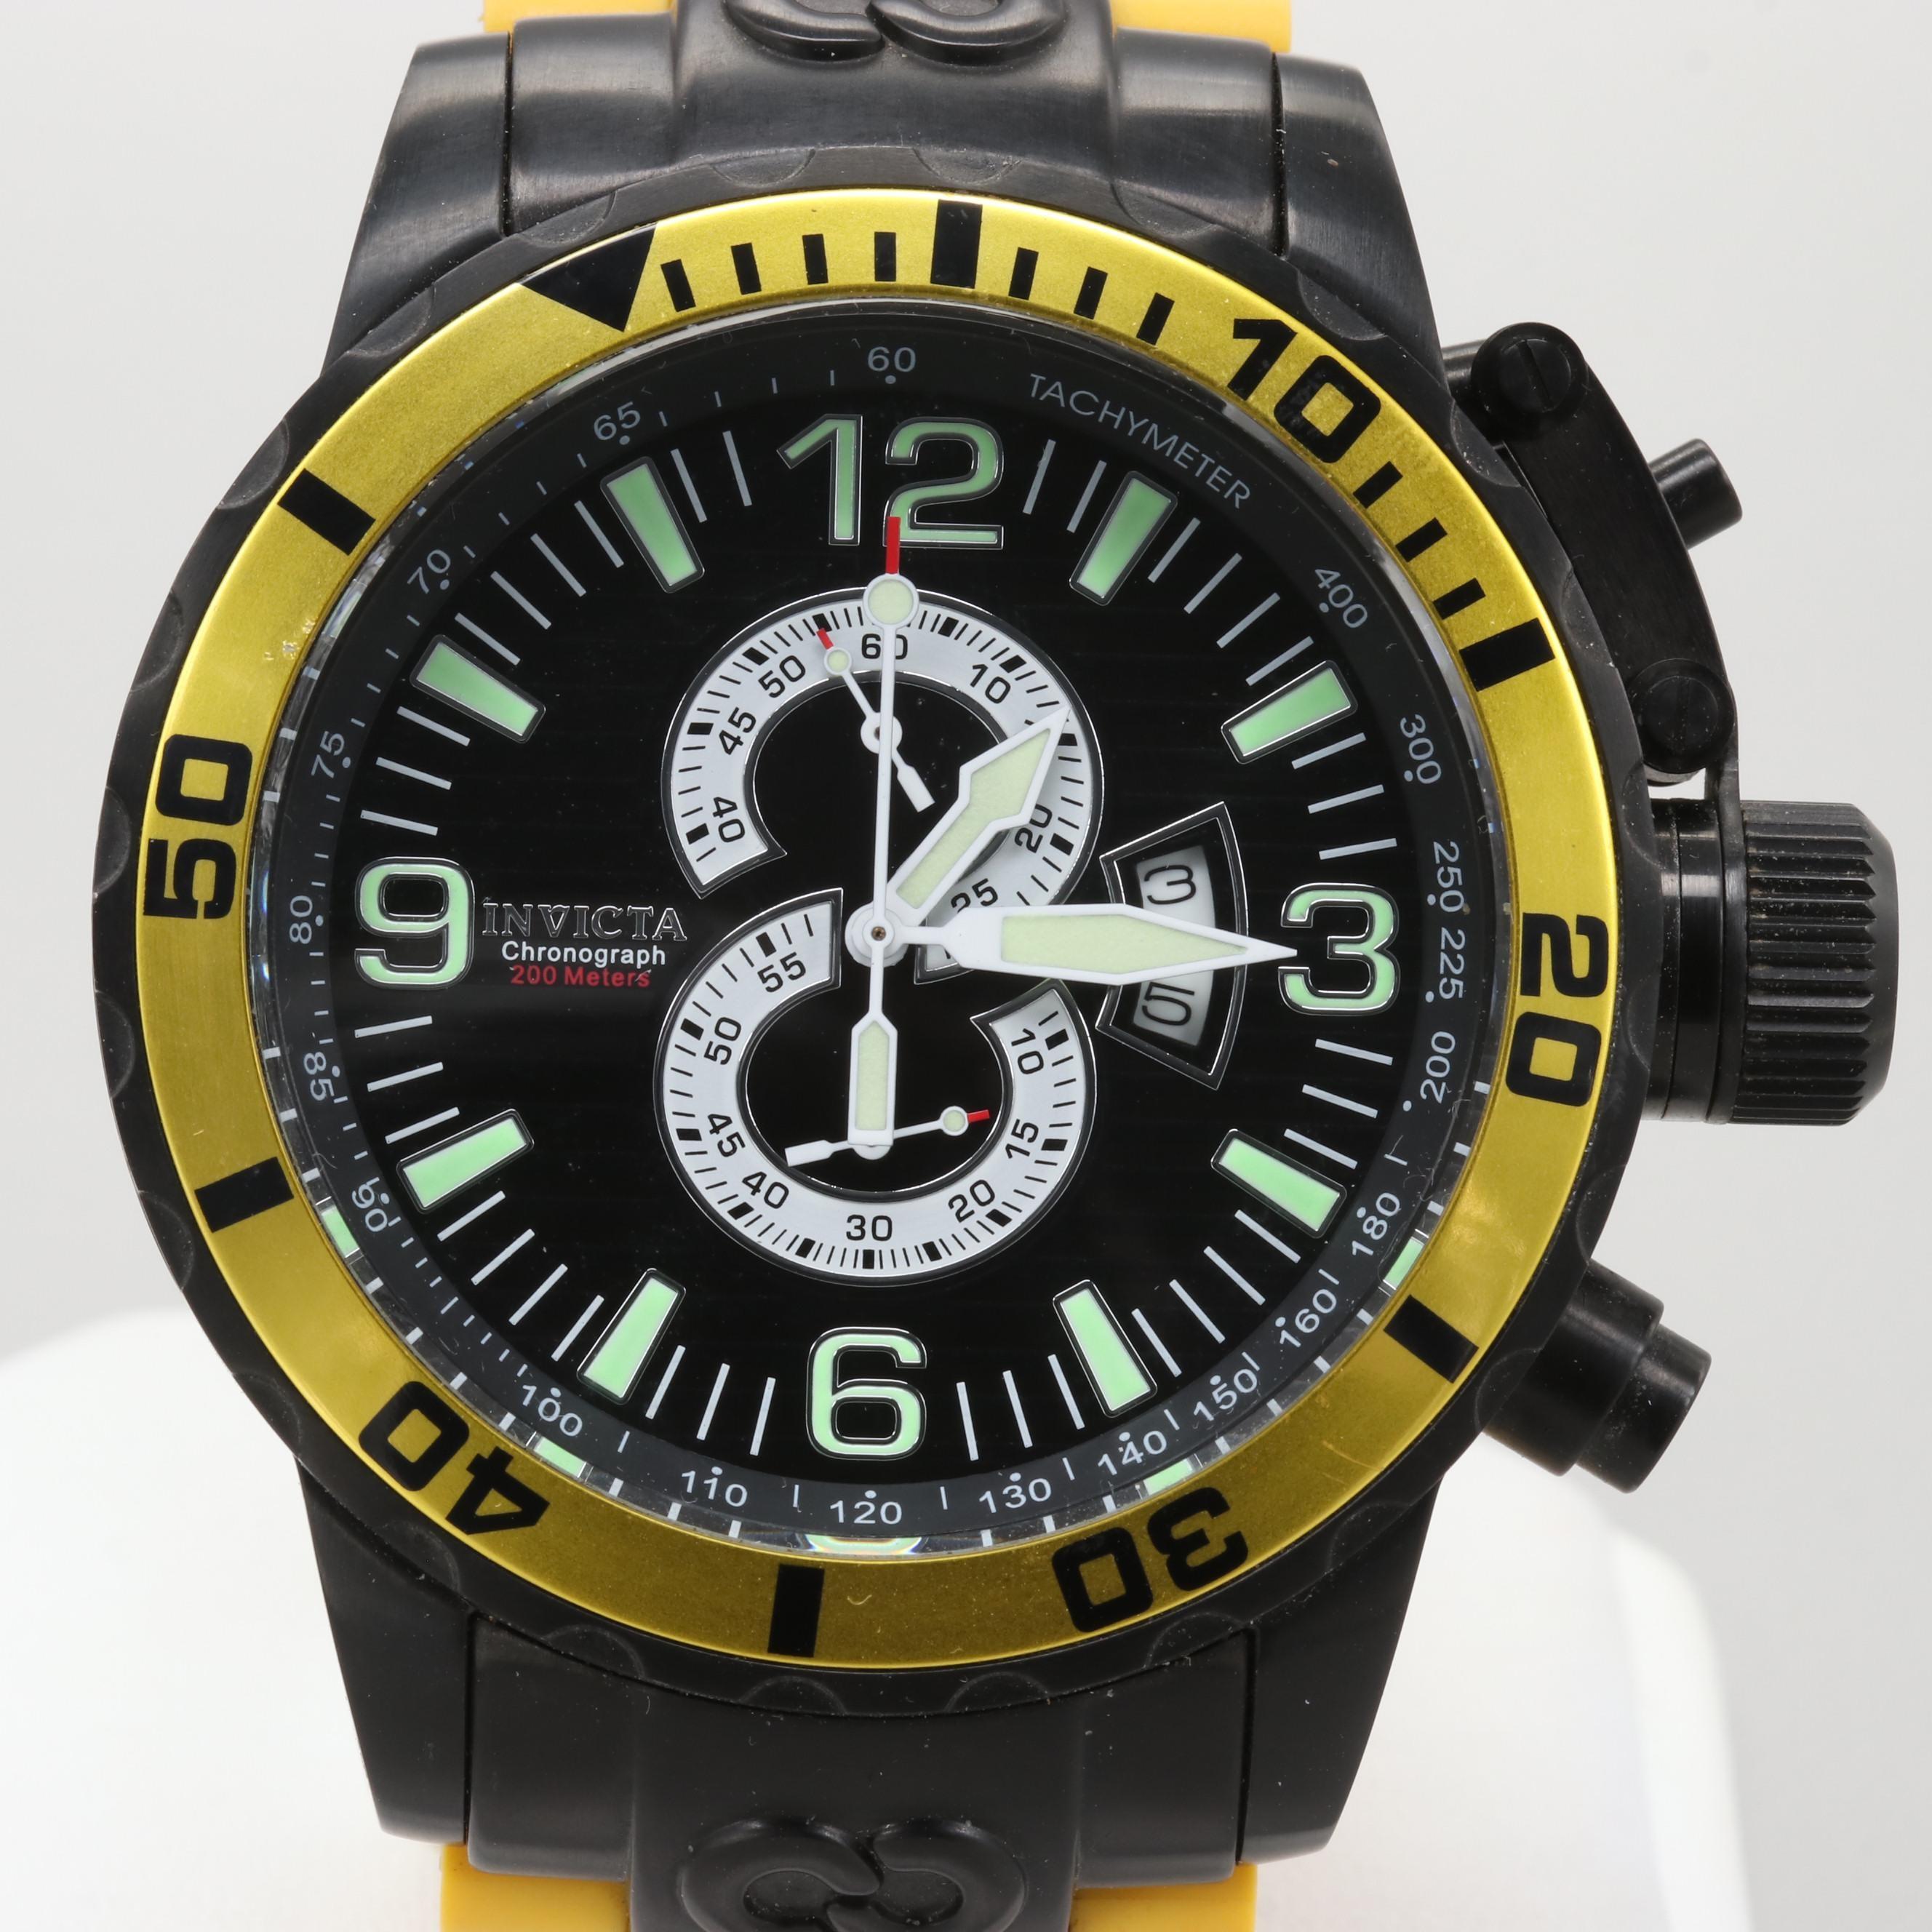 Invicta Corduba Stainless Steel Quartz Chronograph Wristwatch